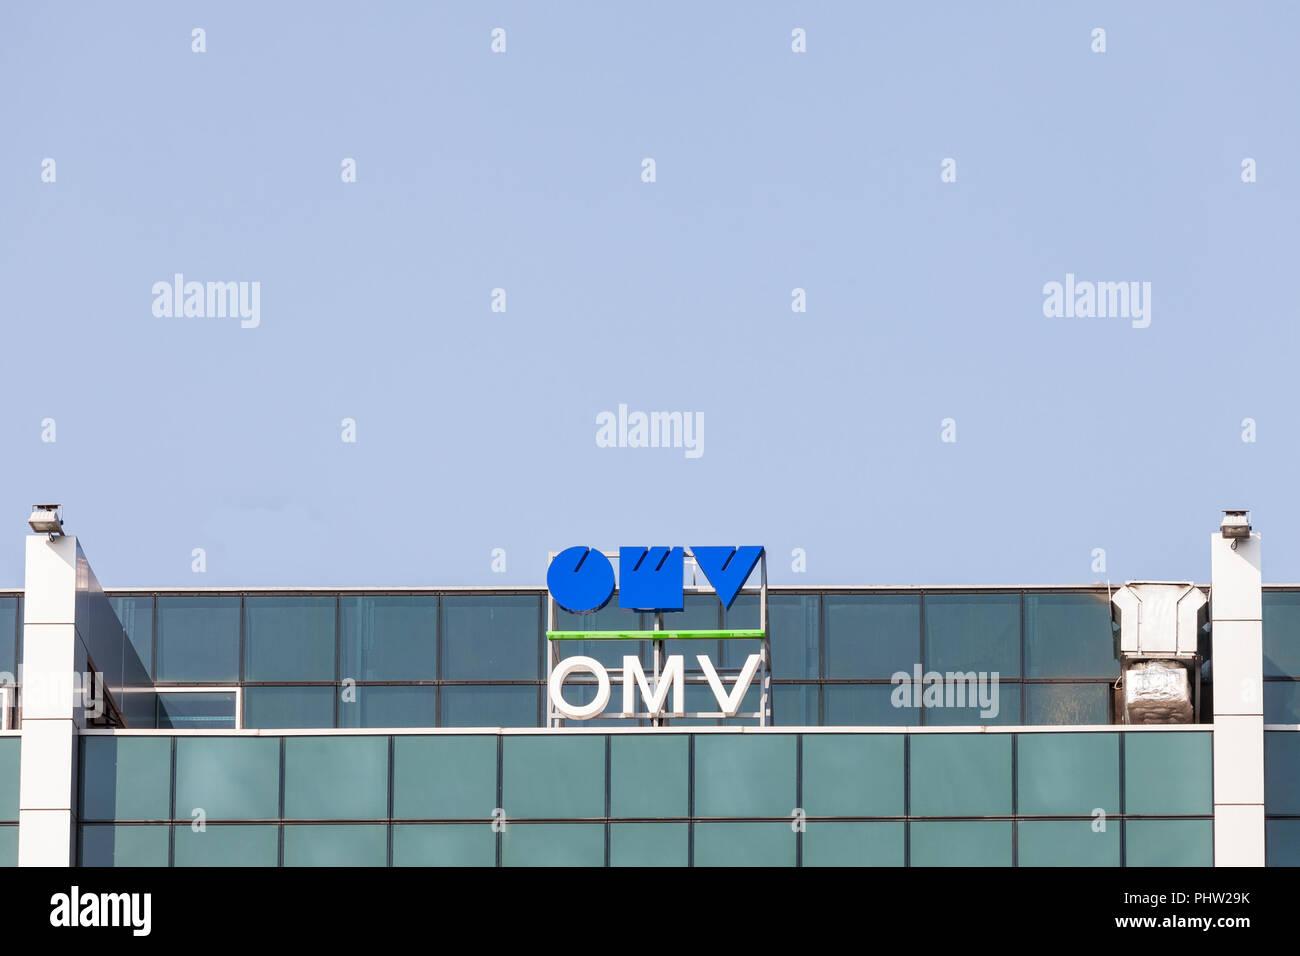 Omv Stock Photos & Omv Stock Images - Alamy